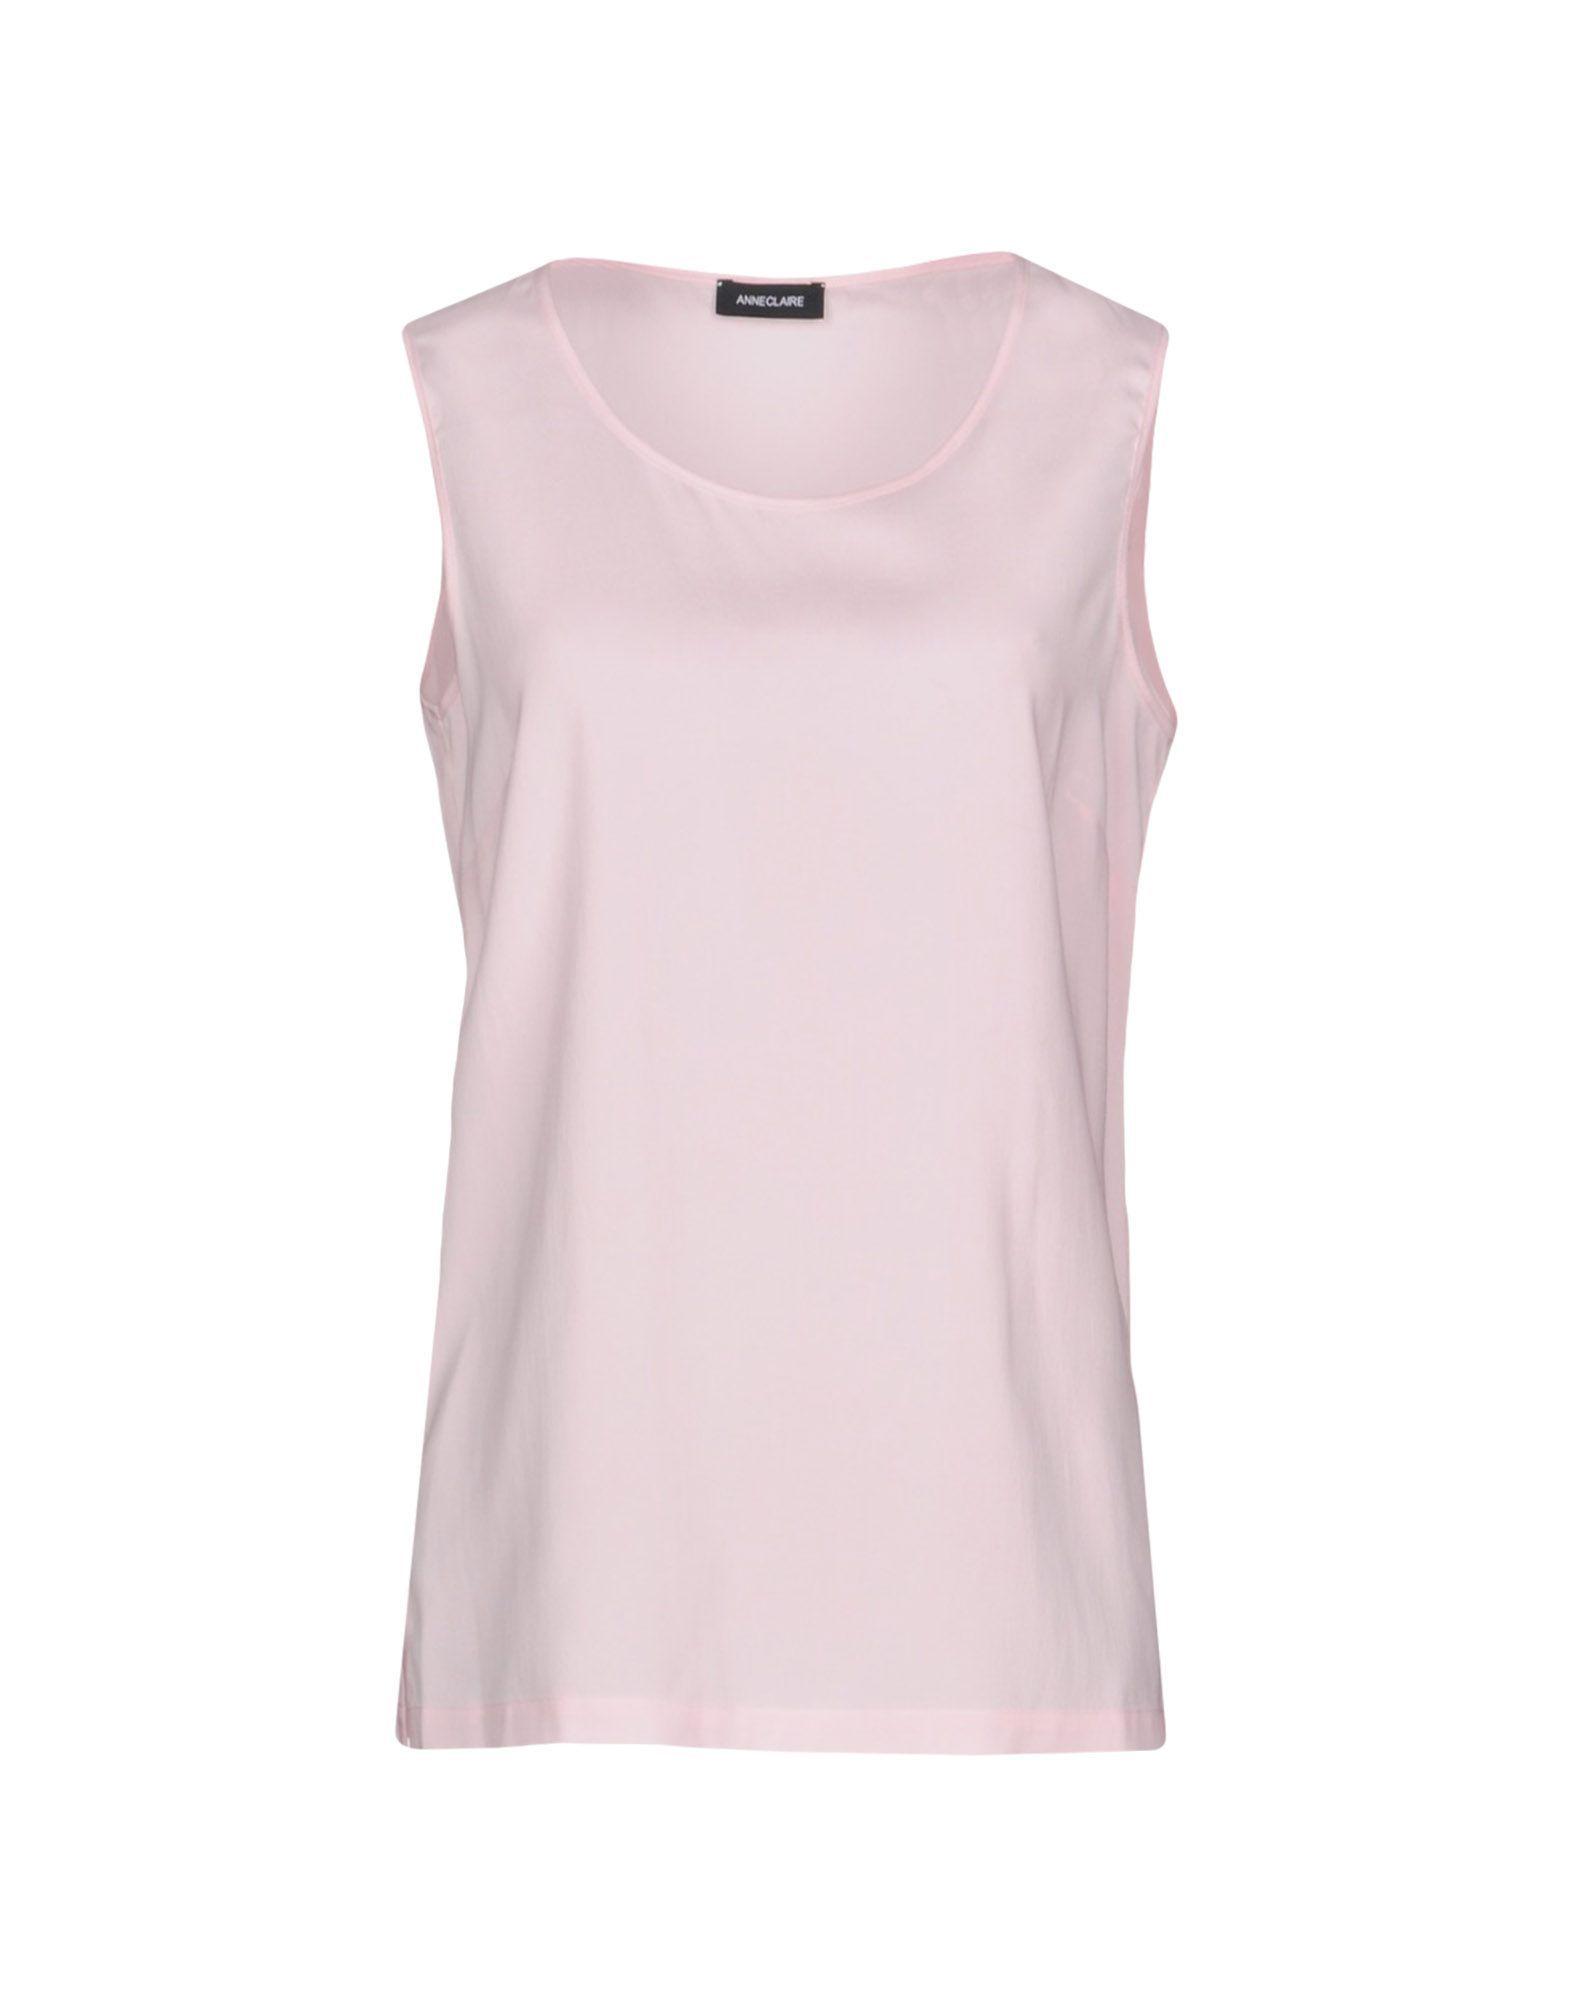 TOPWEAR Anneclaire Pink Woman Silk